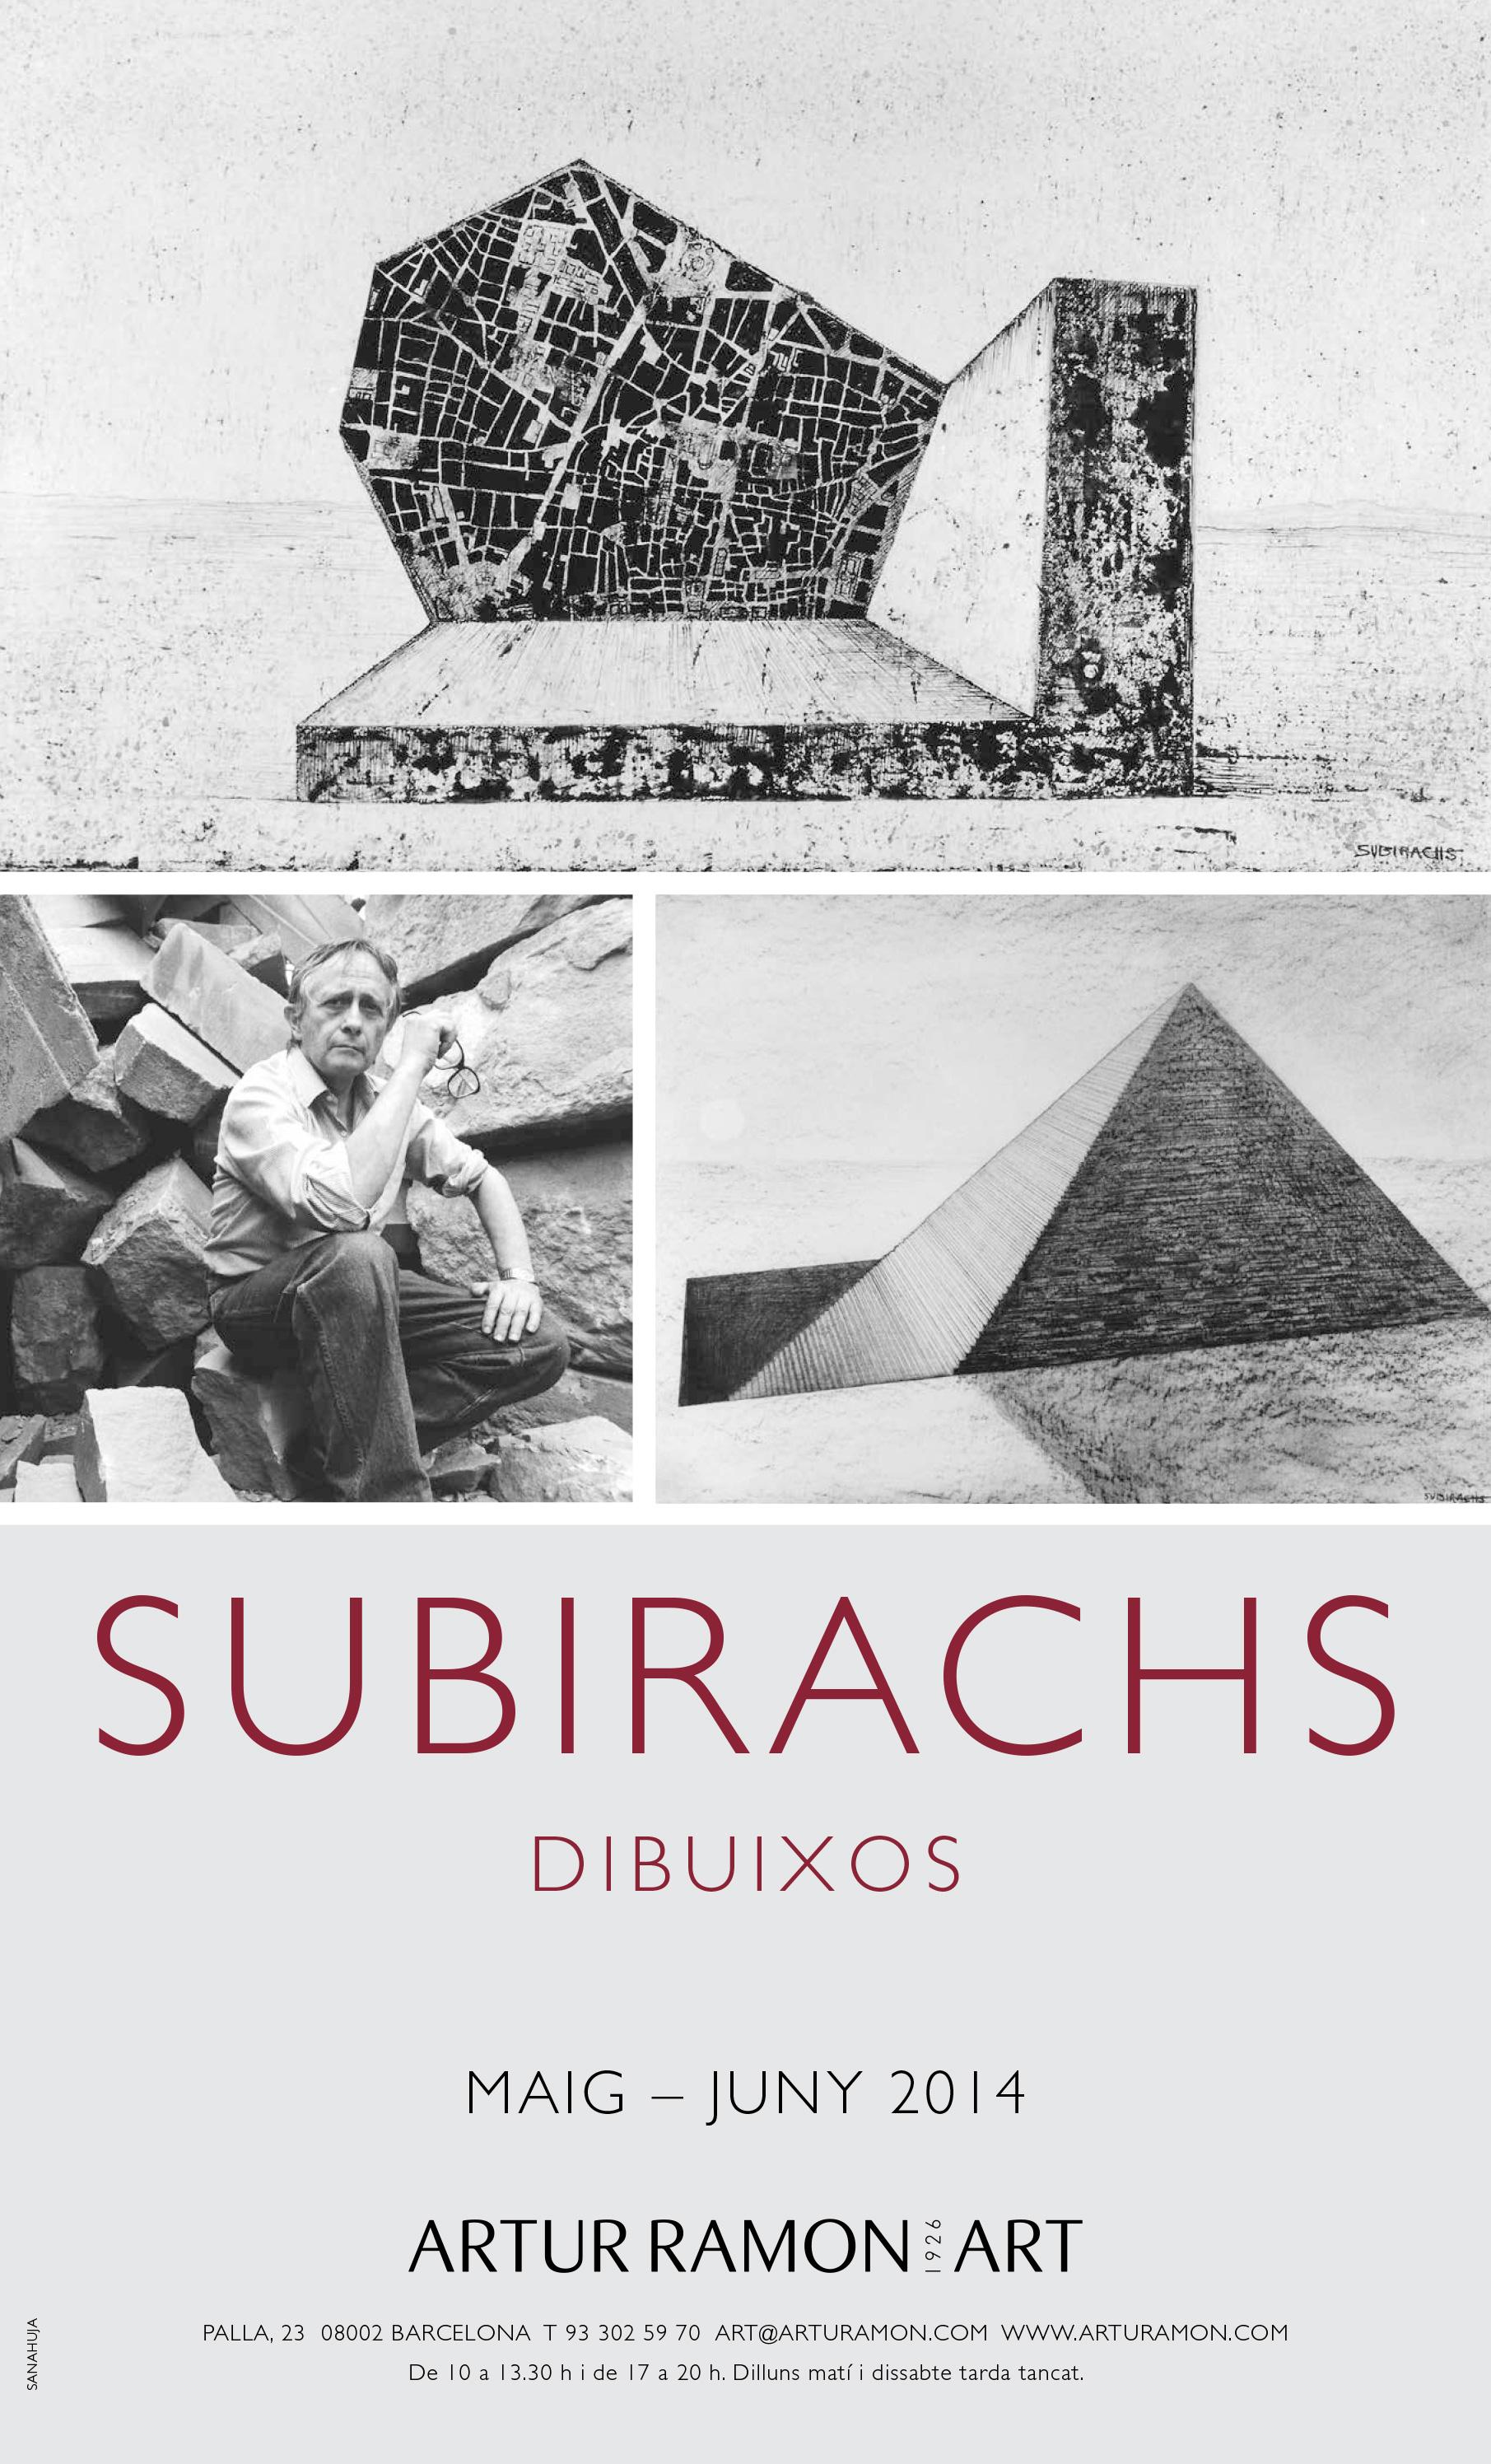 Subirachs, 8 maig - 30 juny 2014